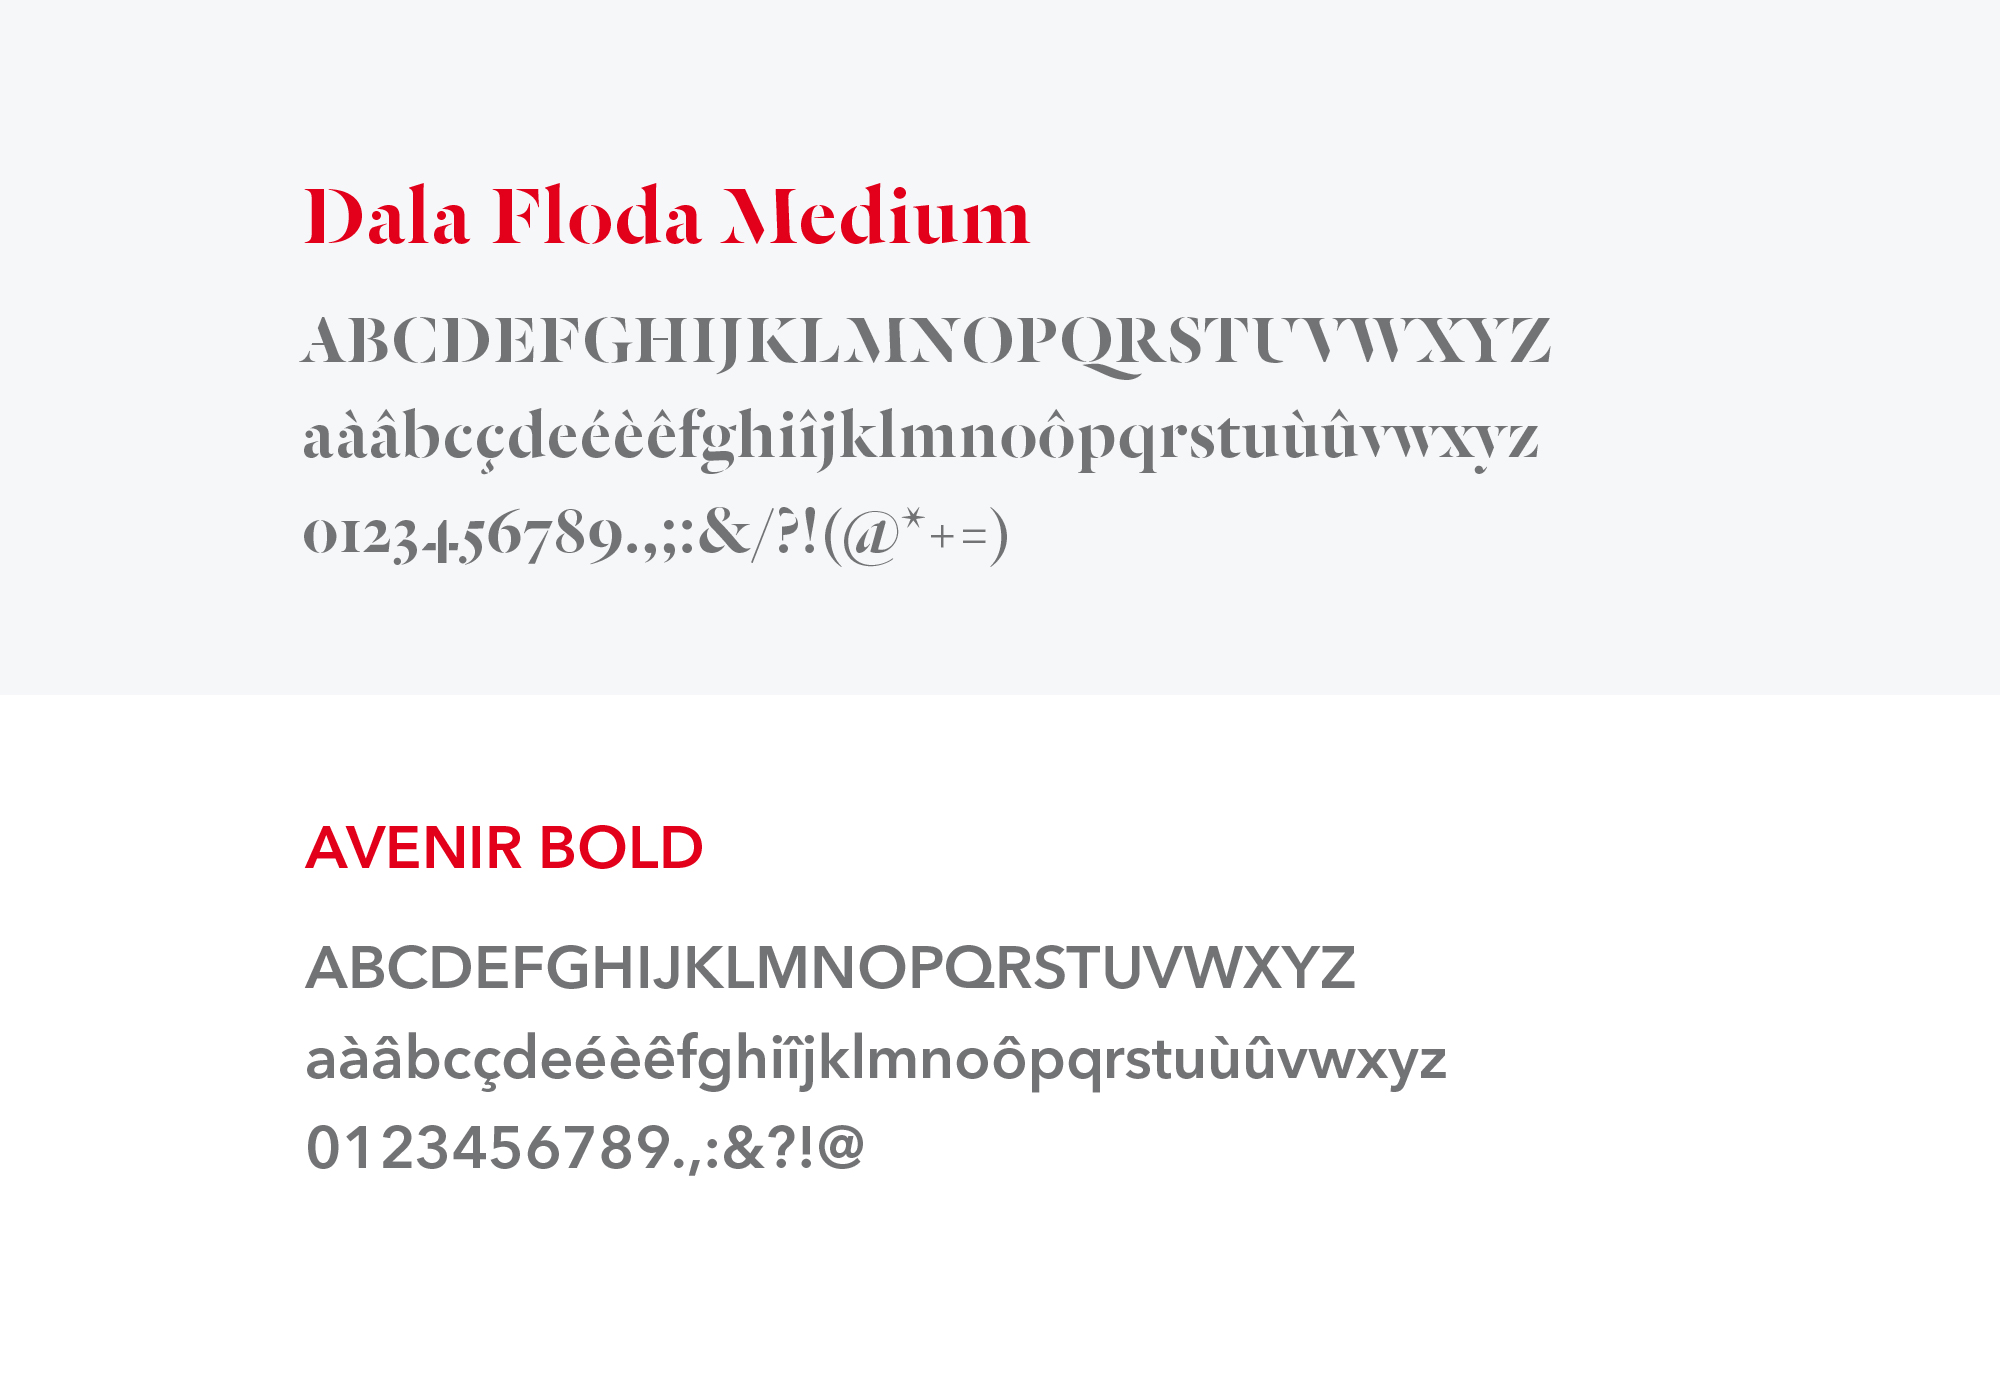 verny identité visuelle typographie